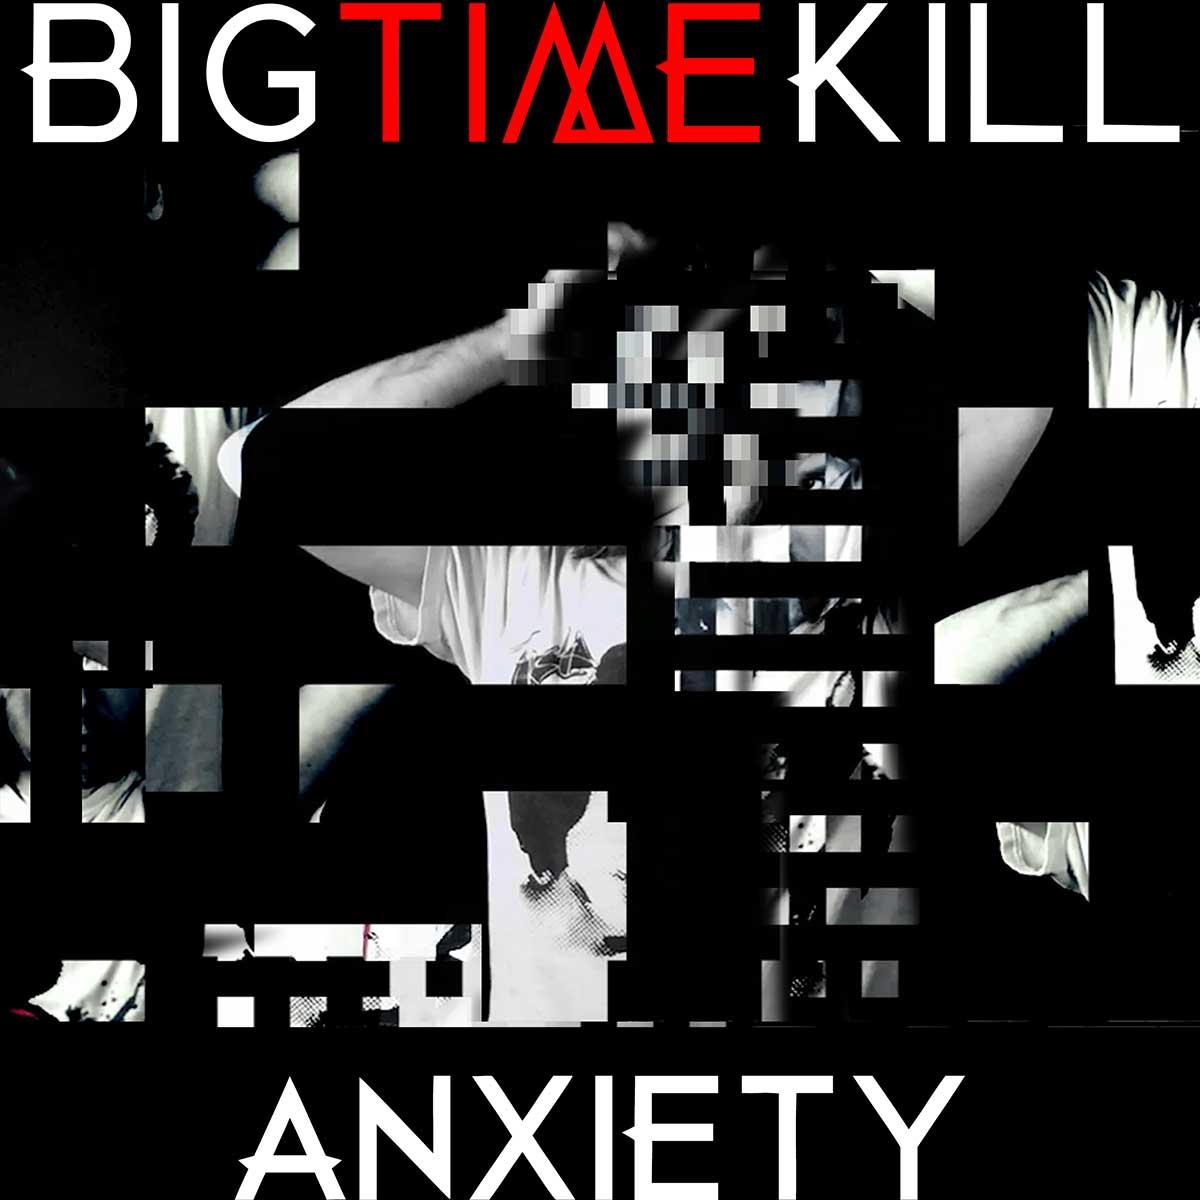 Big Time Kill - Anxiety